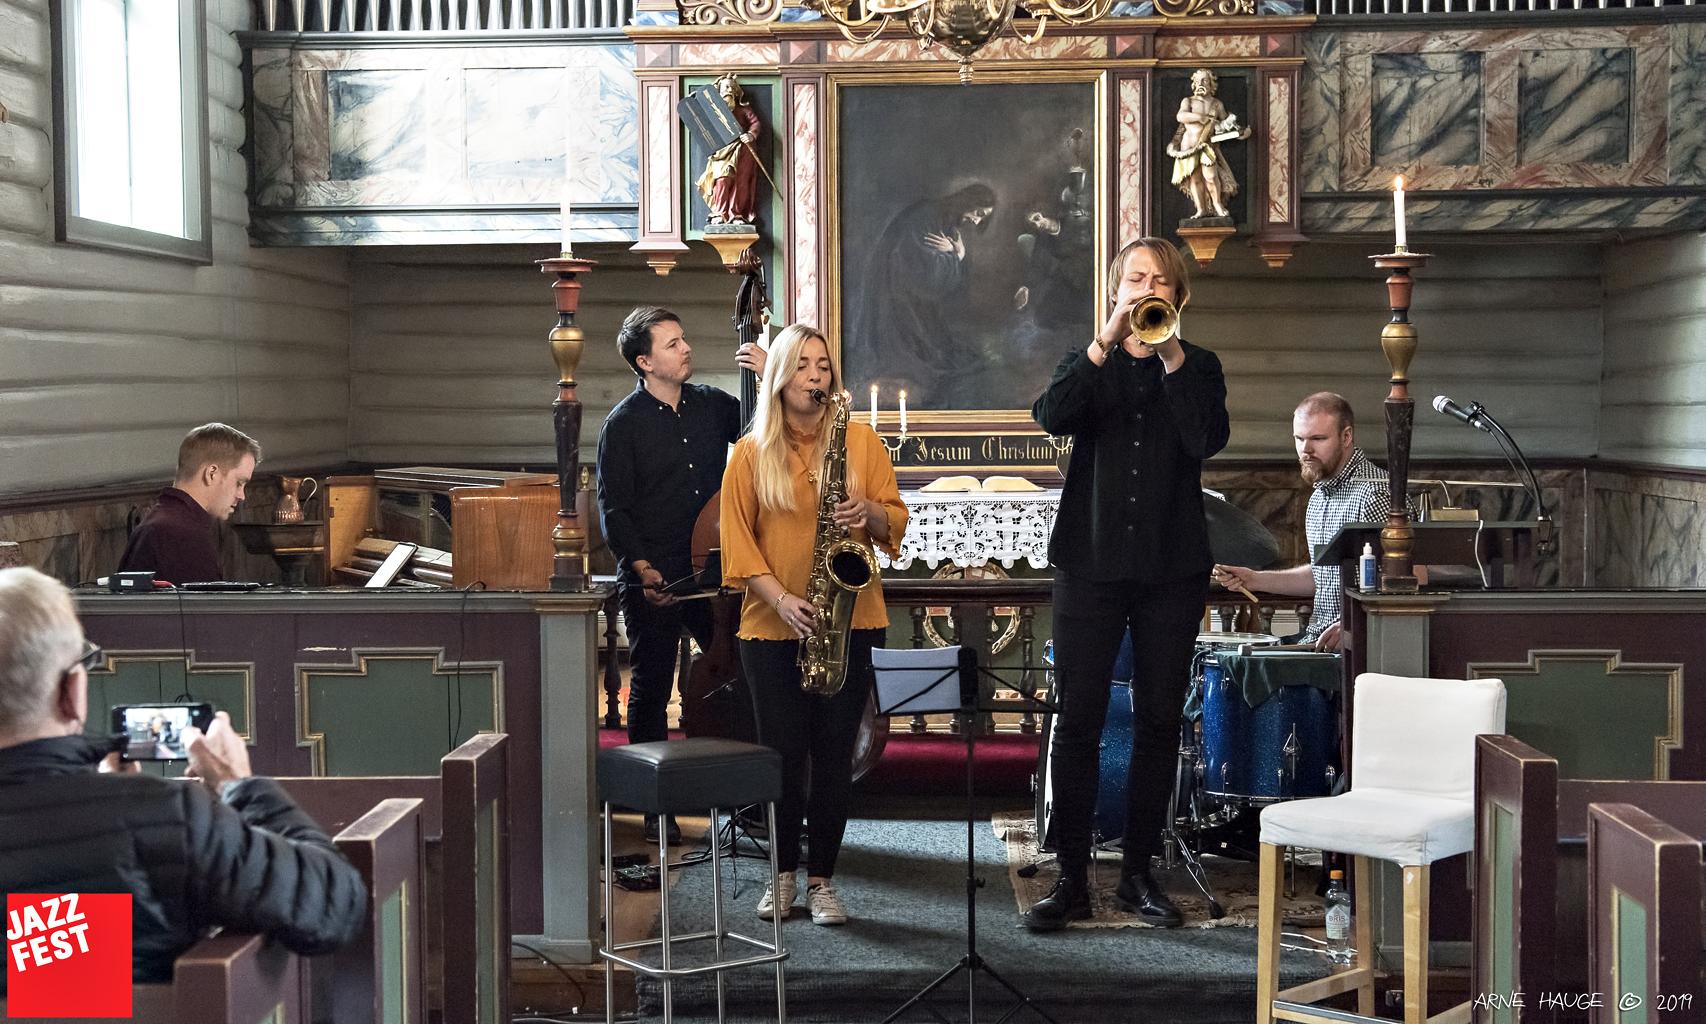 Jazzfilosofisk kafe i Bakke kirke. Foto: Arne Hauge